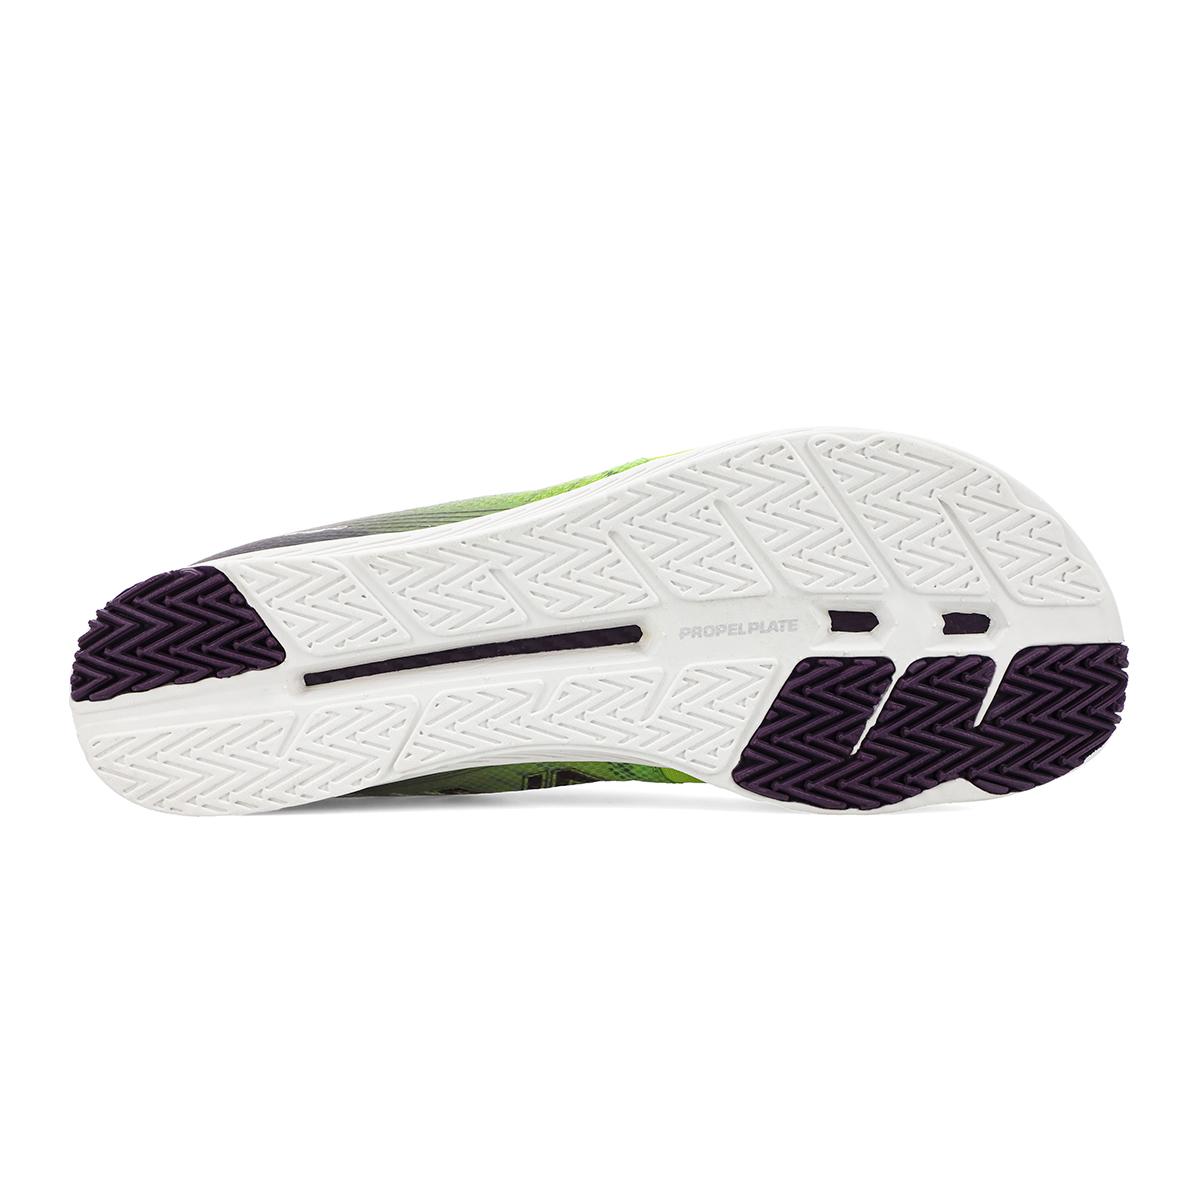 Altra Vanish R Running Shoe - Color: Macaw Green/Purple - Size: M4/W5.5 - Width: Regular, Macaw Green/Purple, large, image 4